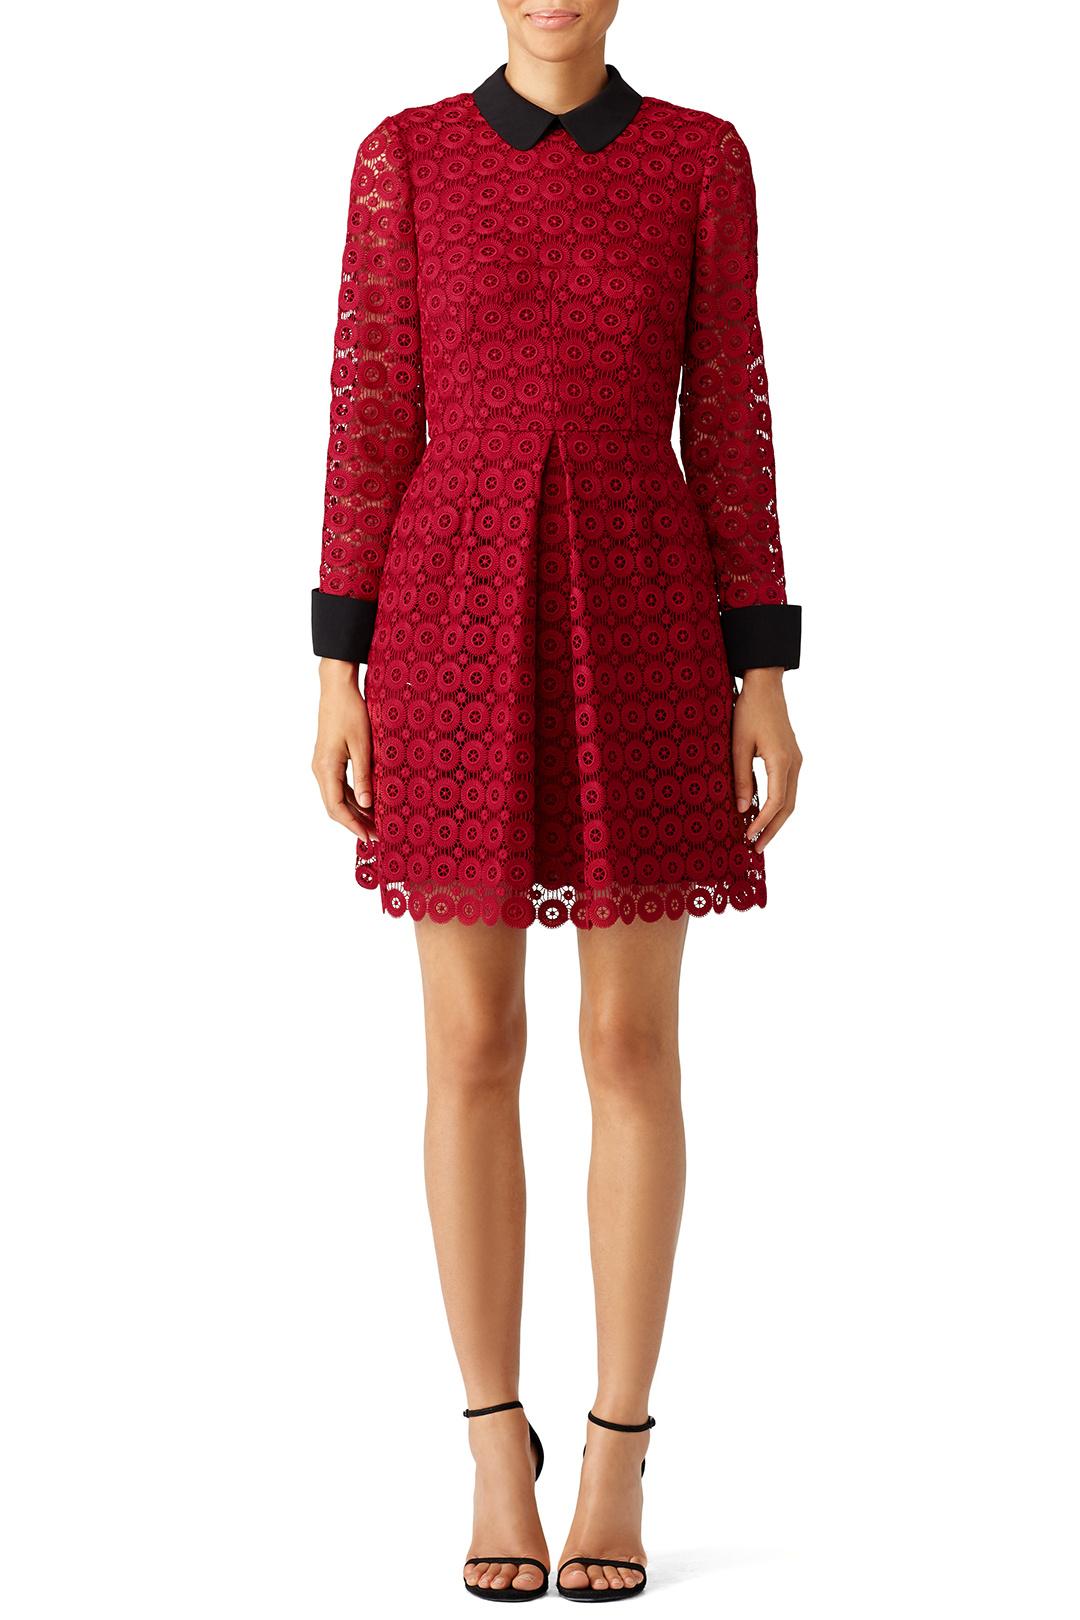 Jill Stuart Red Circular Lace Dress